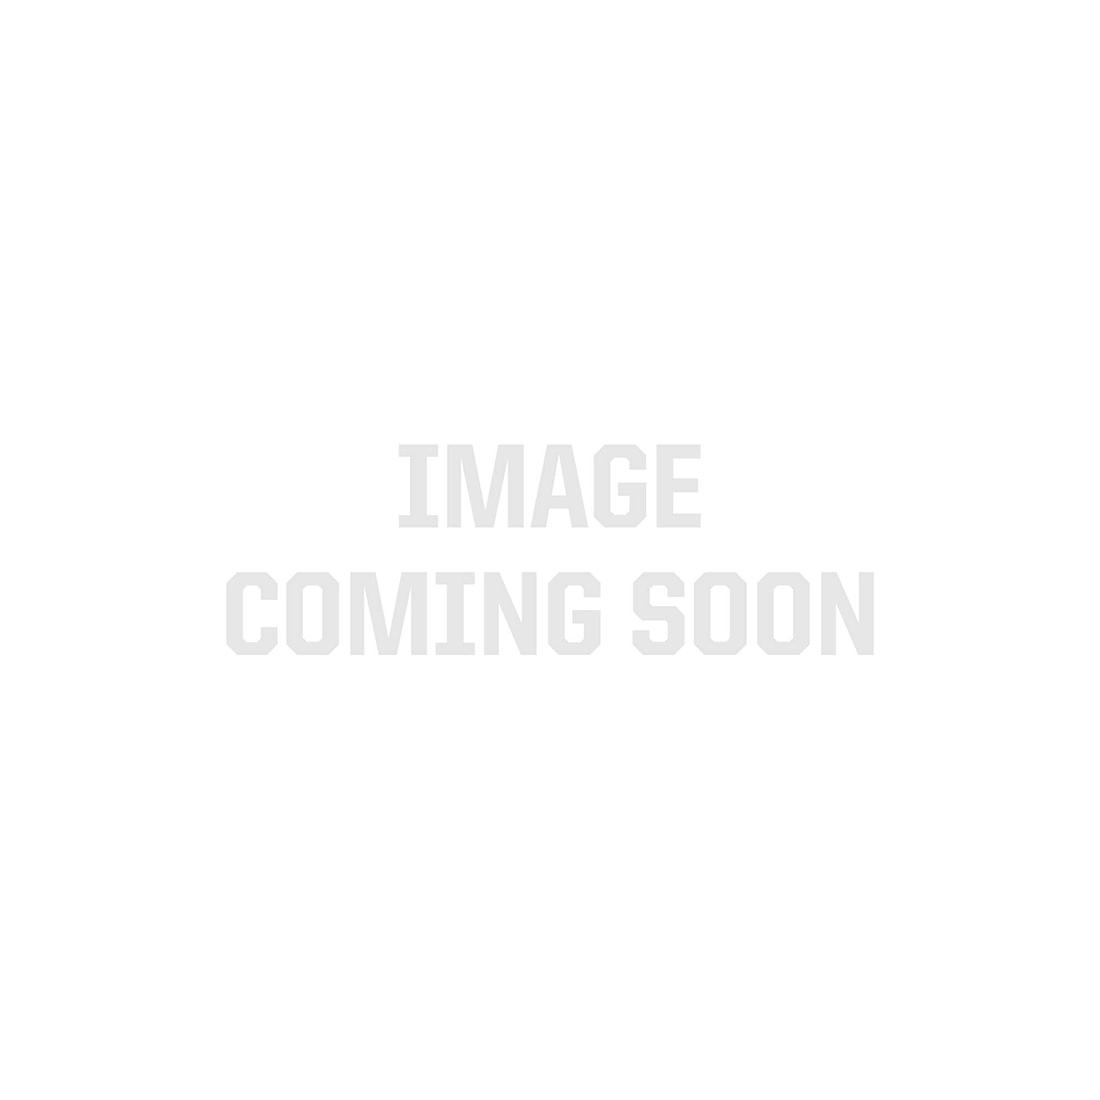 Clear Cover for Klus PAC-ALU, STOS-ALU, TRIADA Series Aluminum Channel